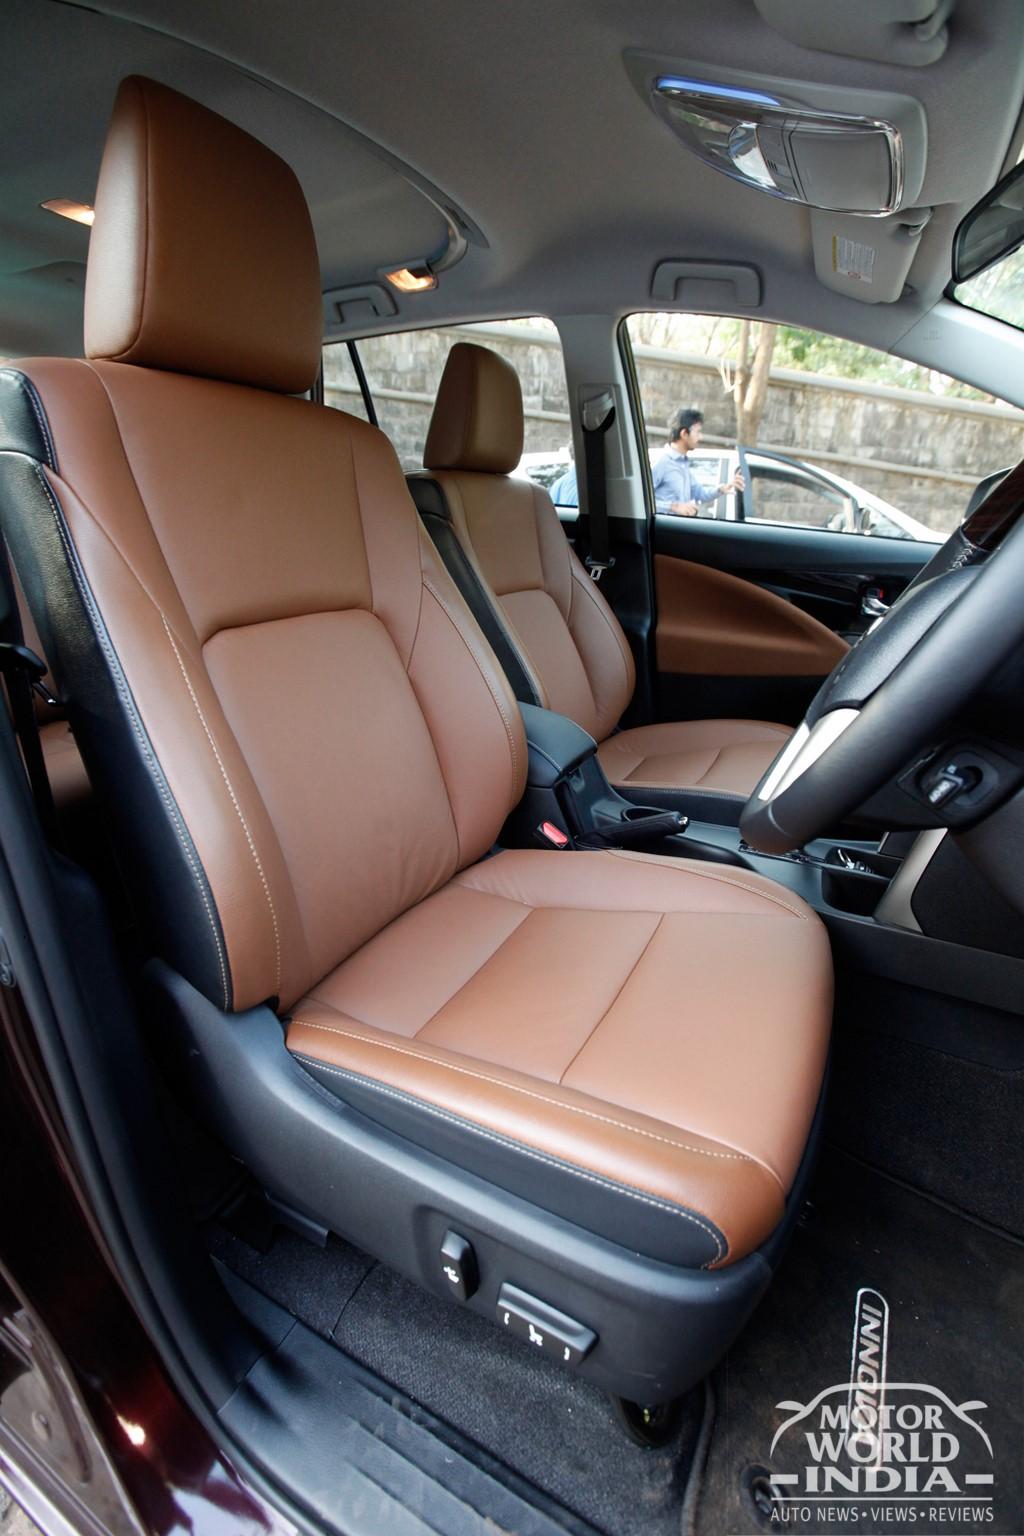 Toyota-Innova-Crysta-Interior-Front-Seat (3)